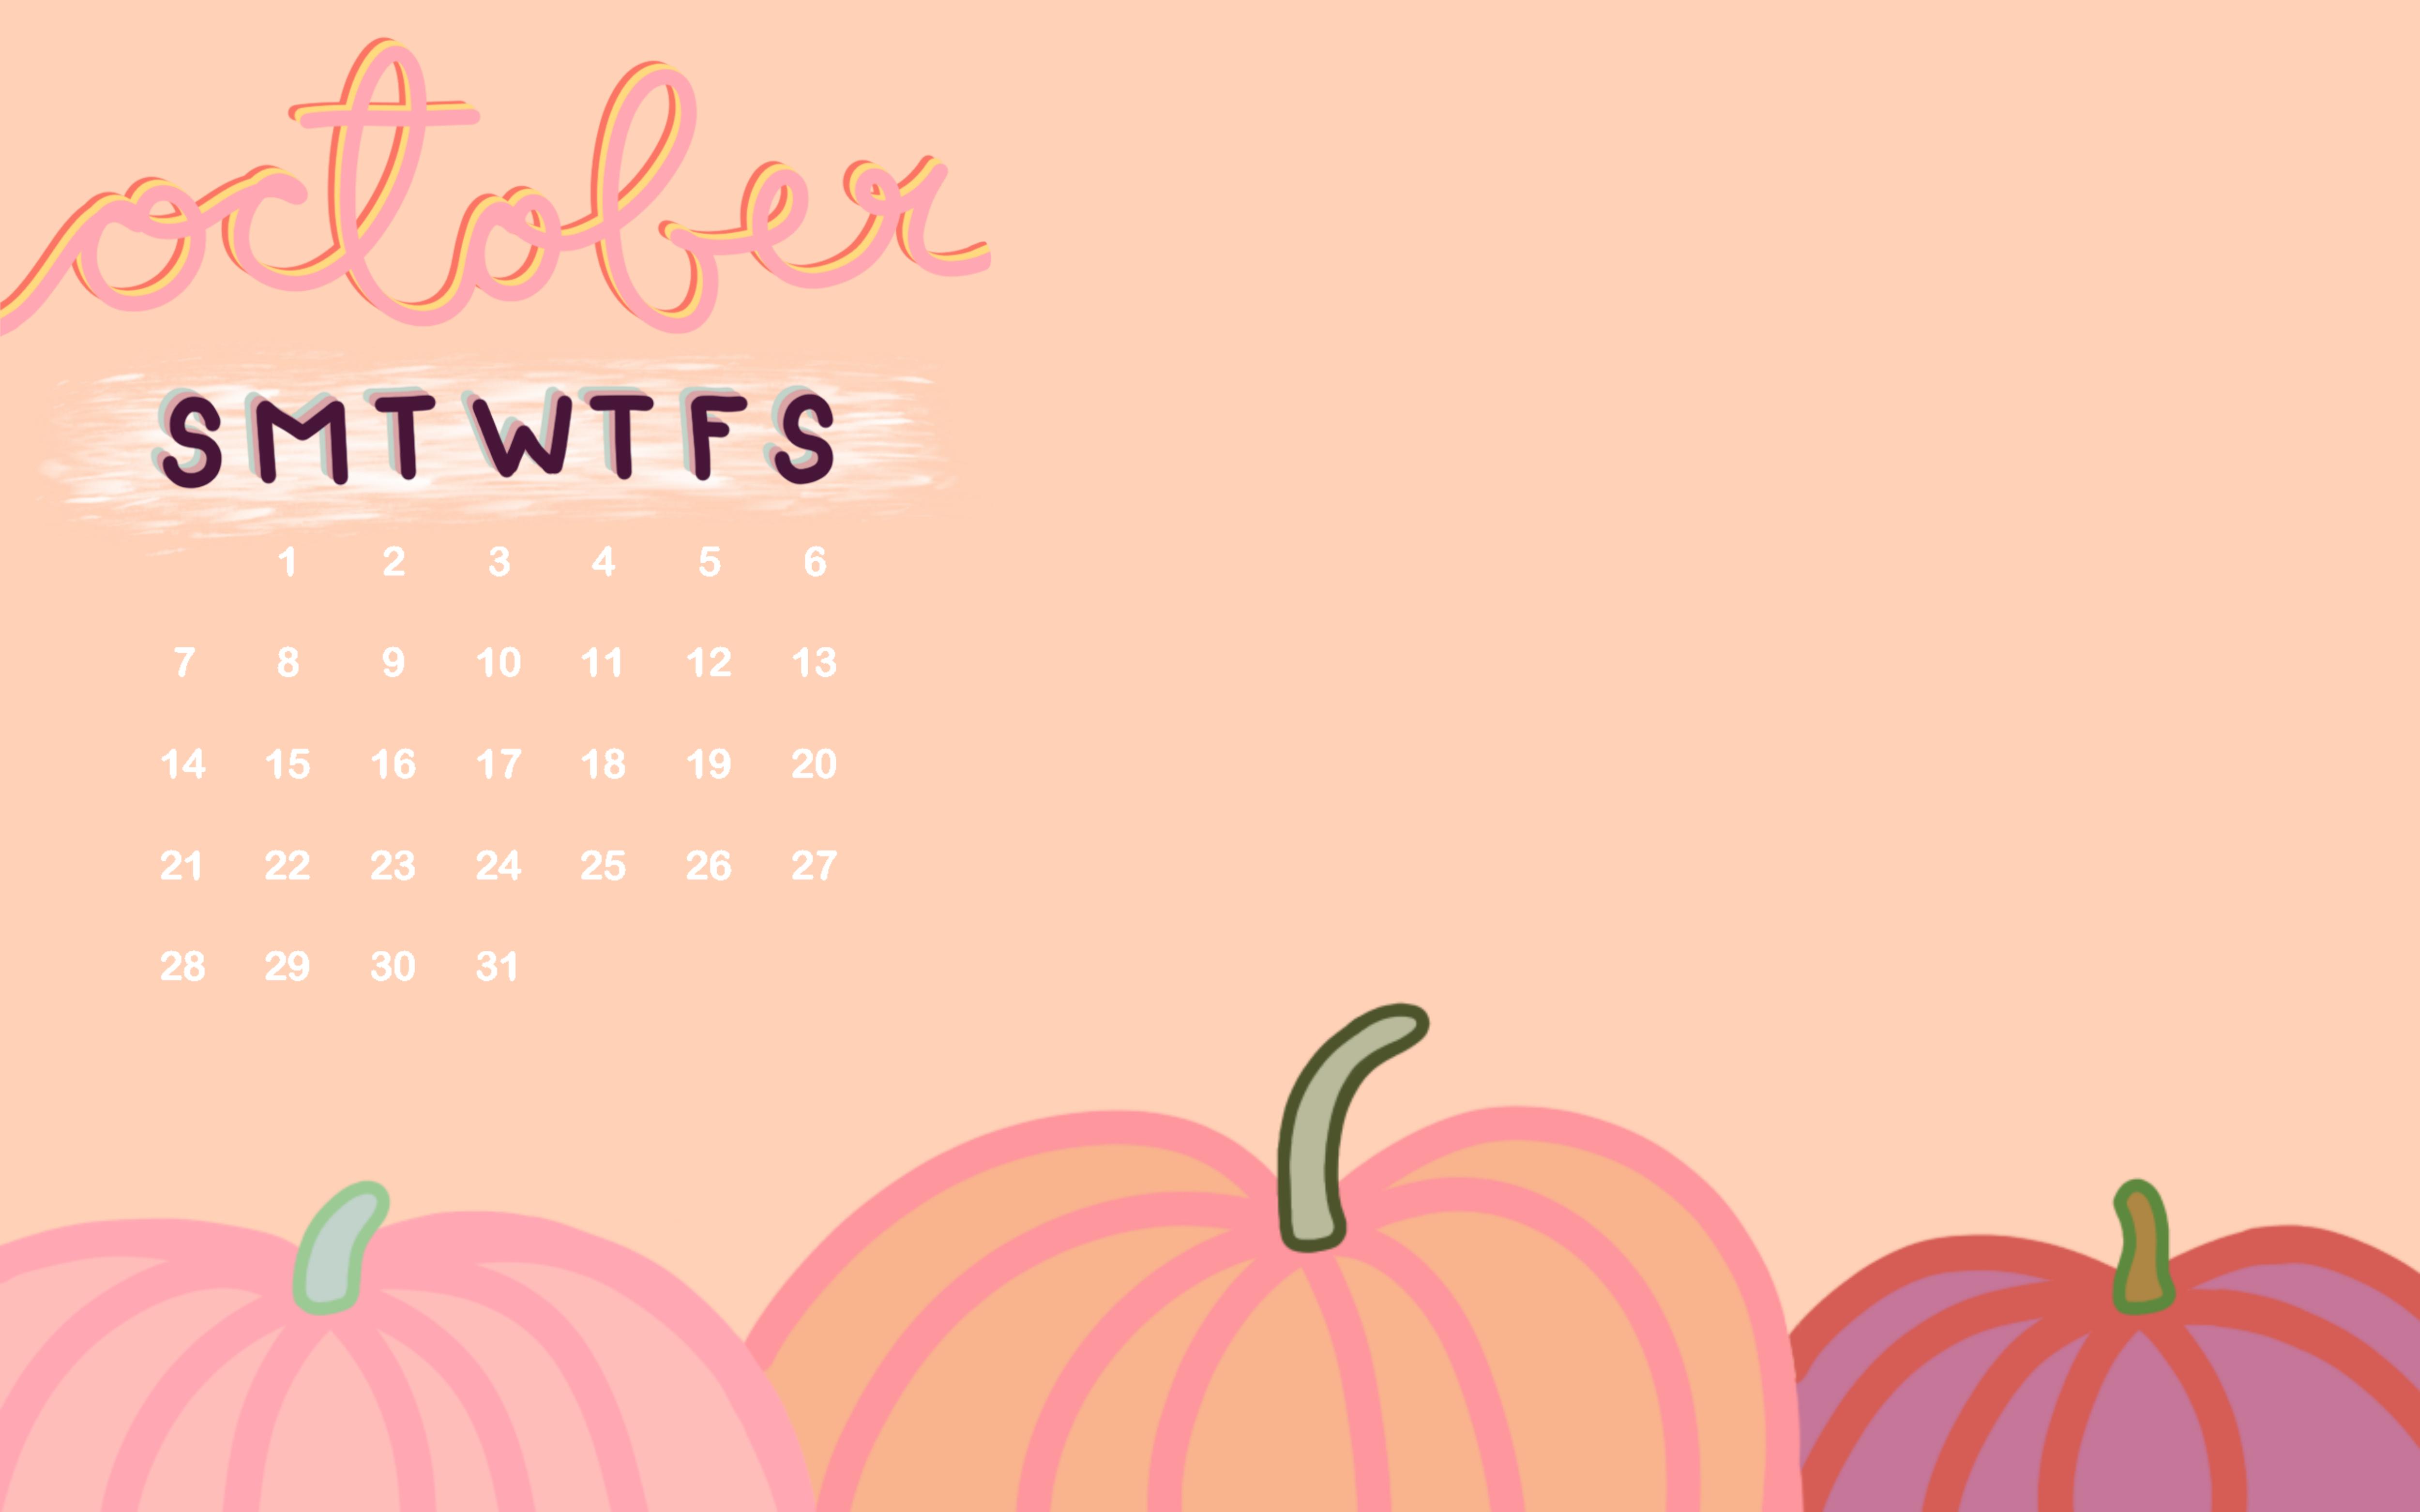 October 2018 Desktop Pumpkin Calendar Wallpaper Download